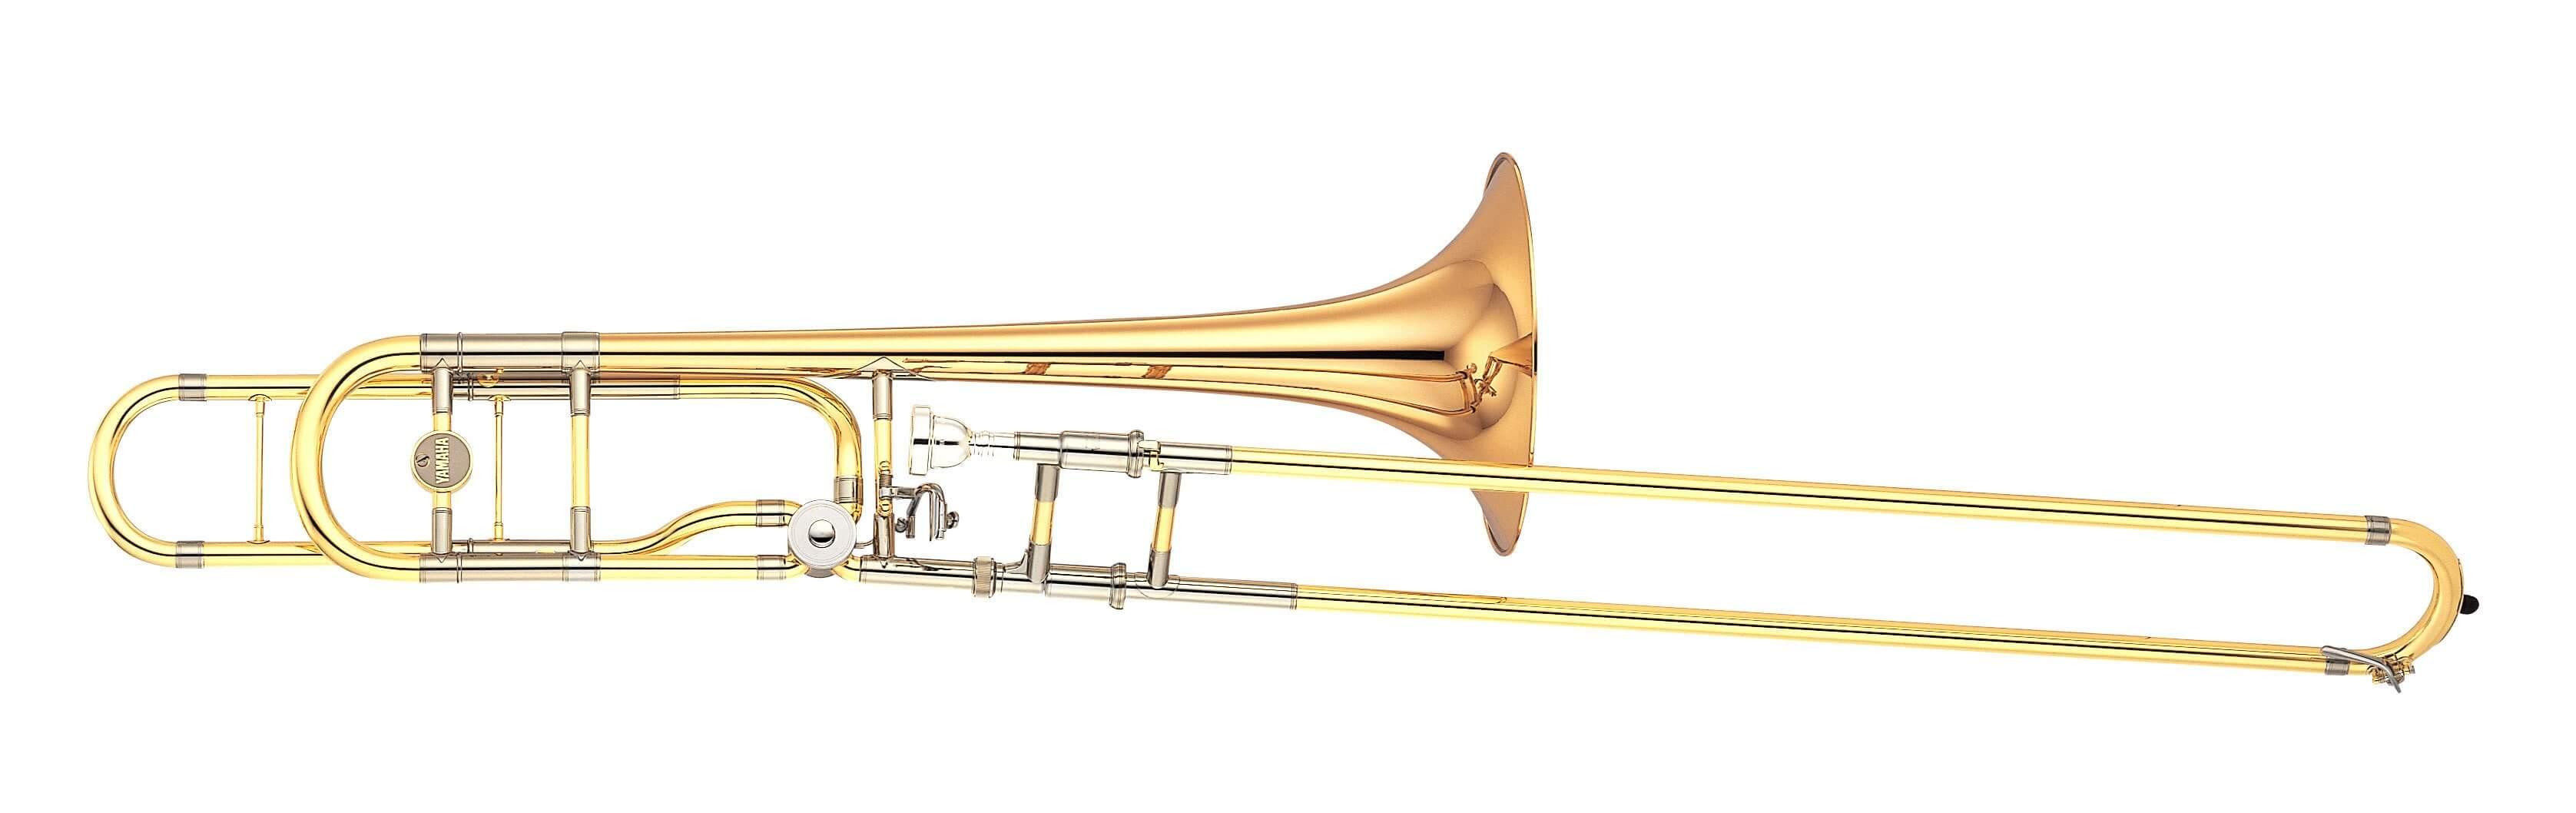 Trombon Tenor/Bajo Yamaha Ysl-882GO 03